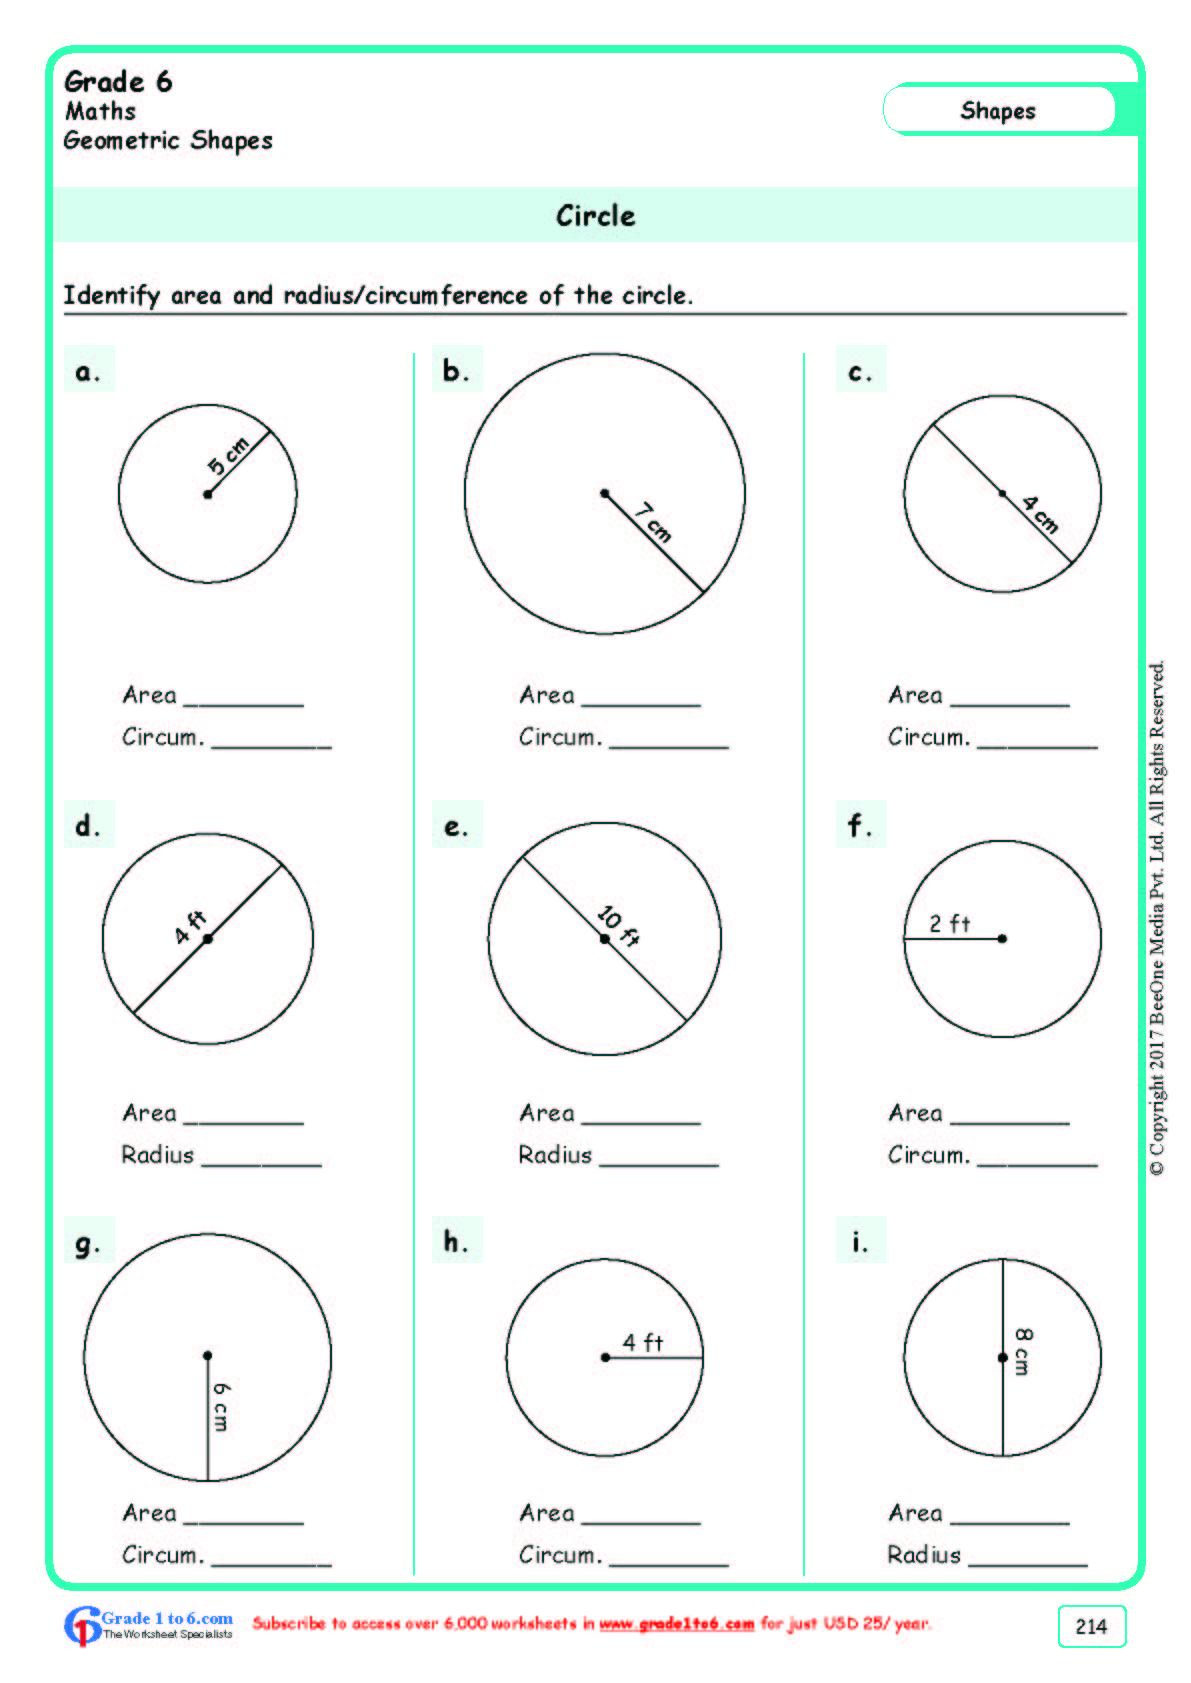 Grade 6 Class Six Circle Worksheets Ade1to6